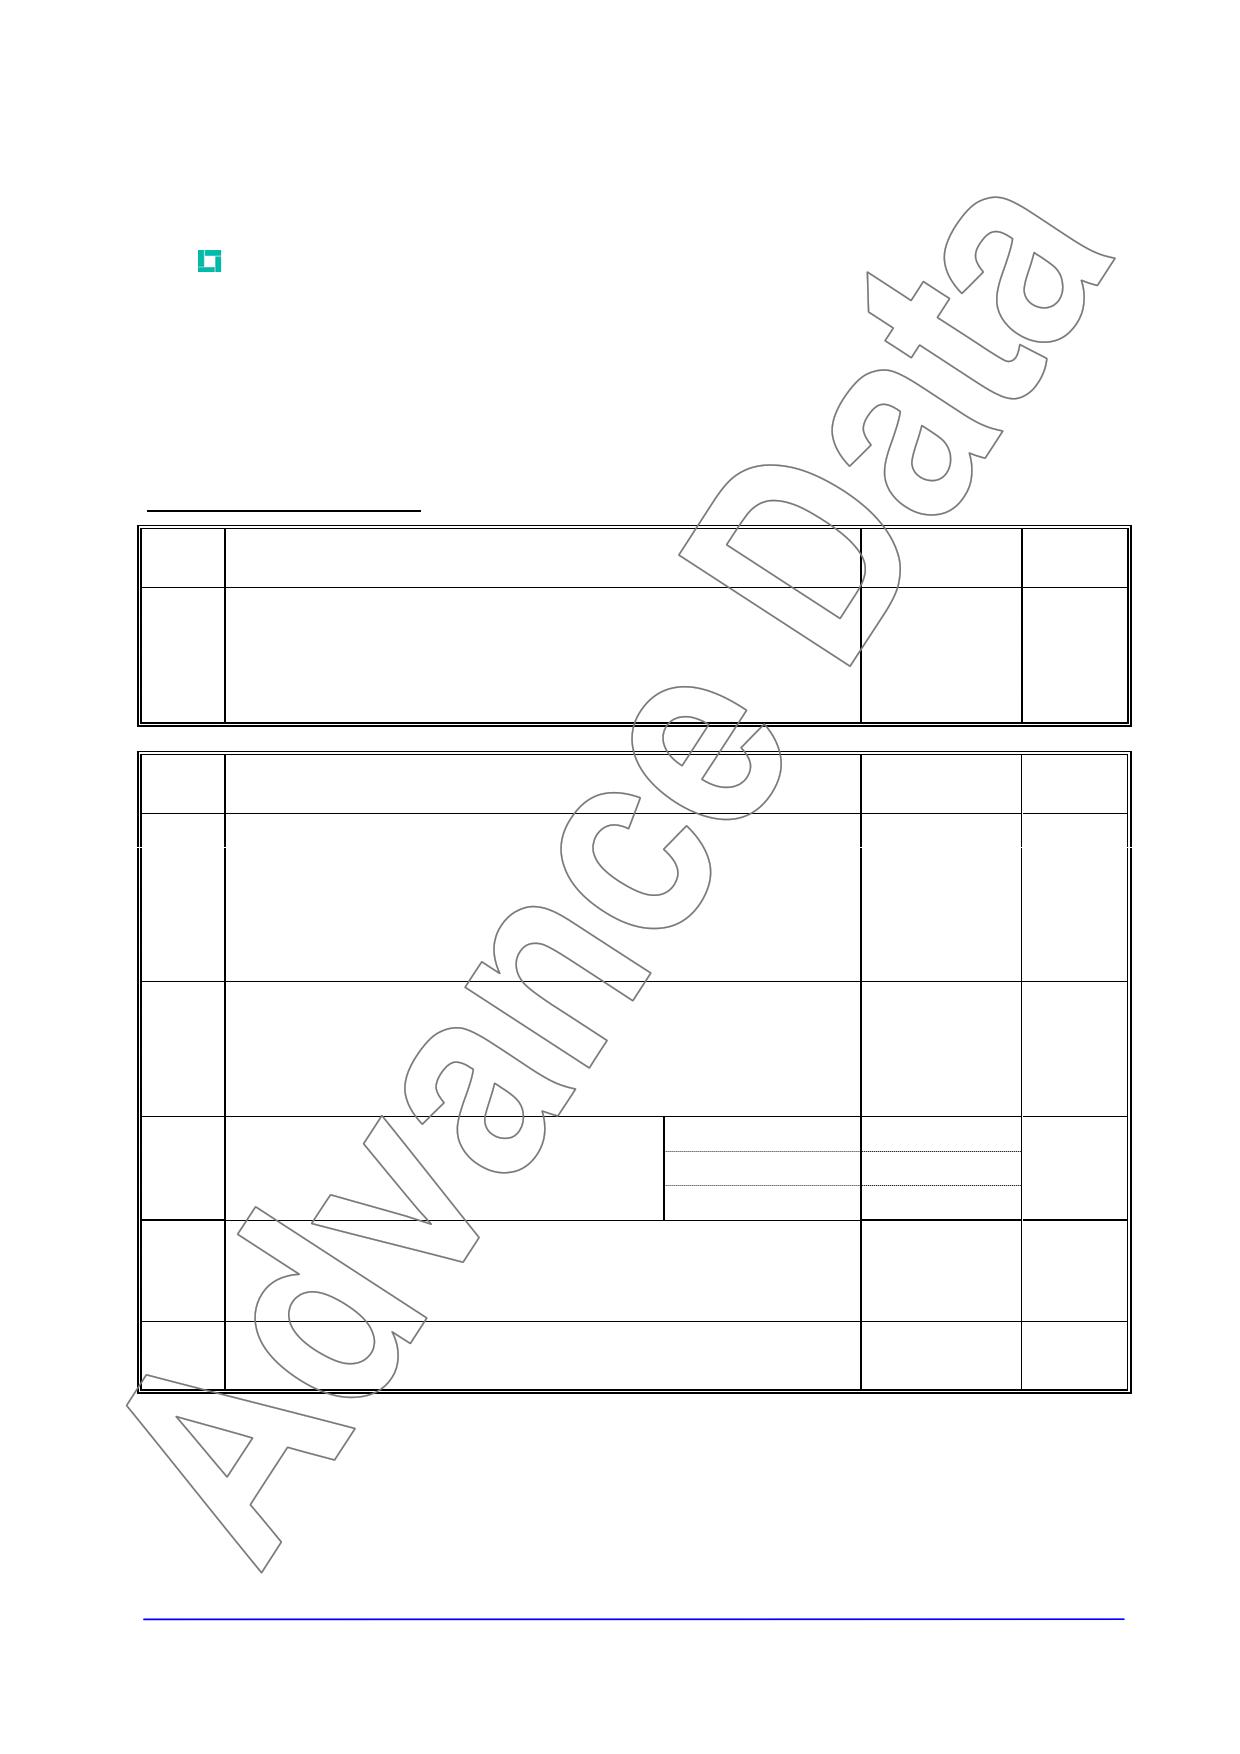 K0620QE600 datasheet